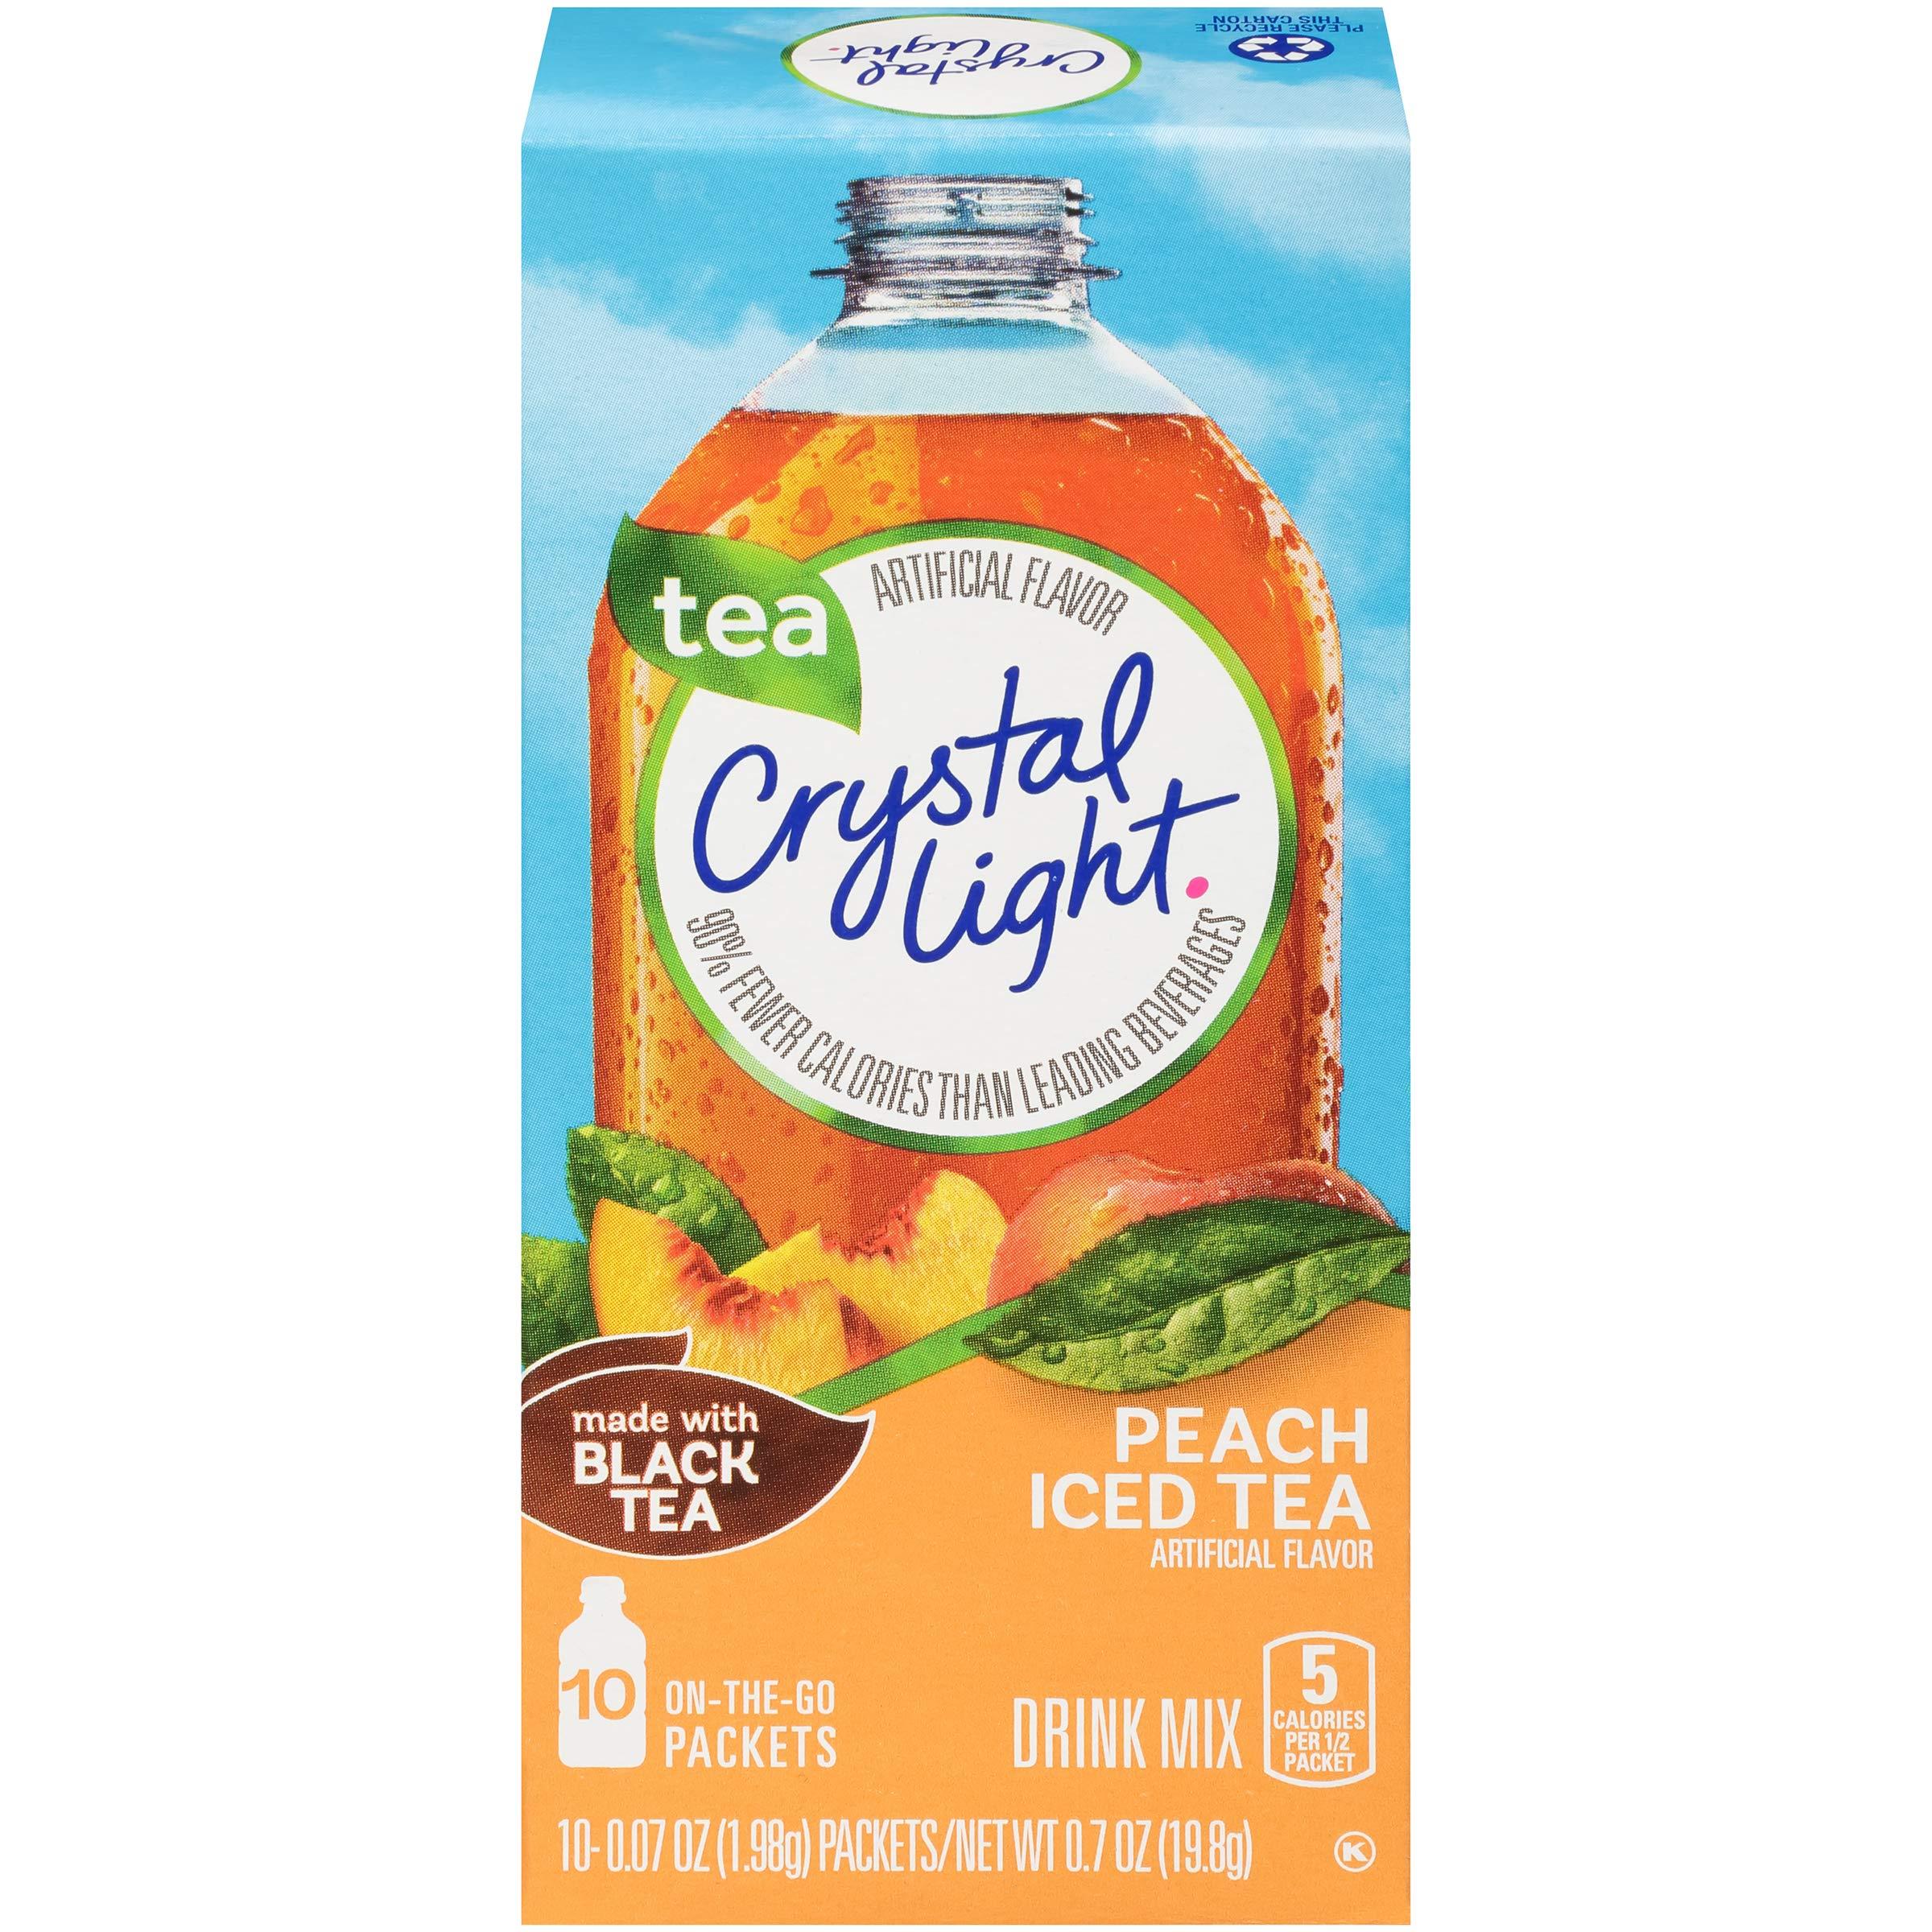 Crystal Light On The Go Peach Iced Tea, 10-Packet Box (Pack of 30) by Crystal Light